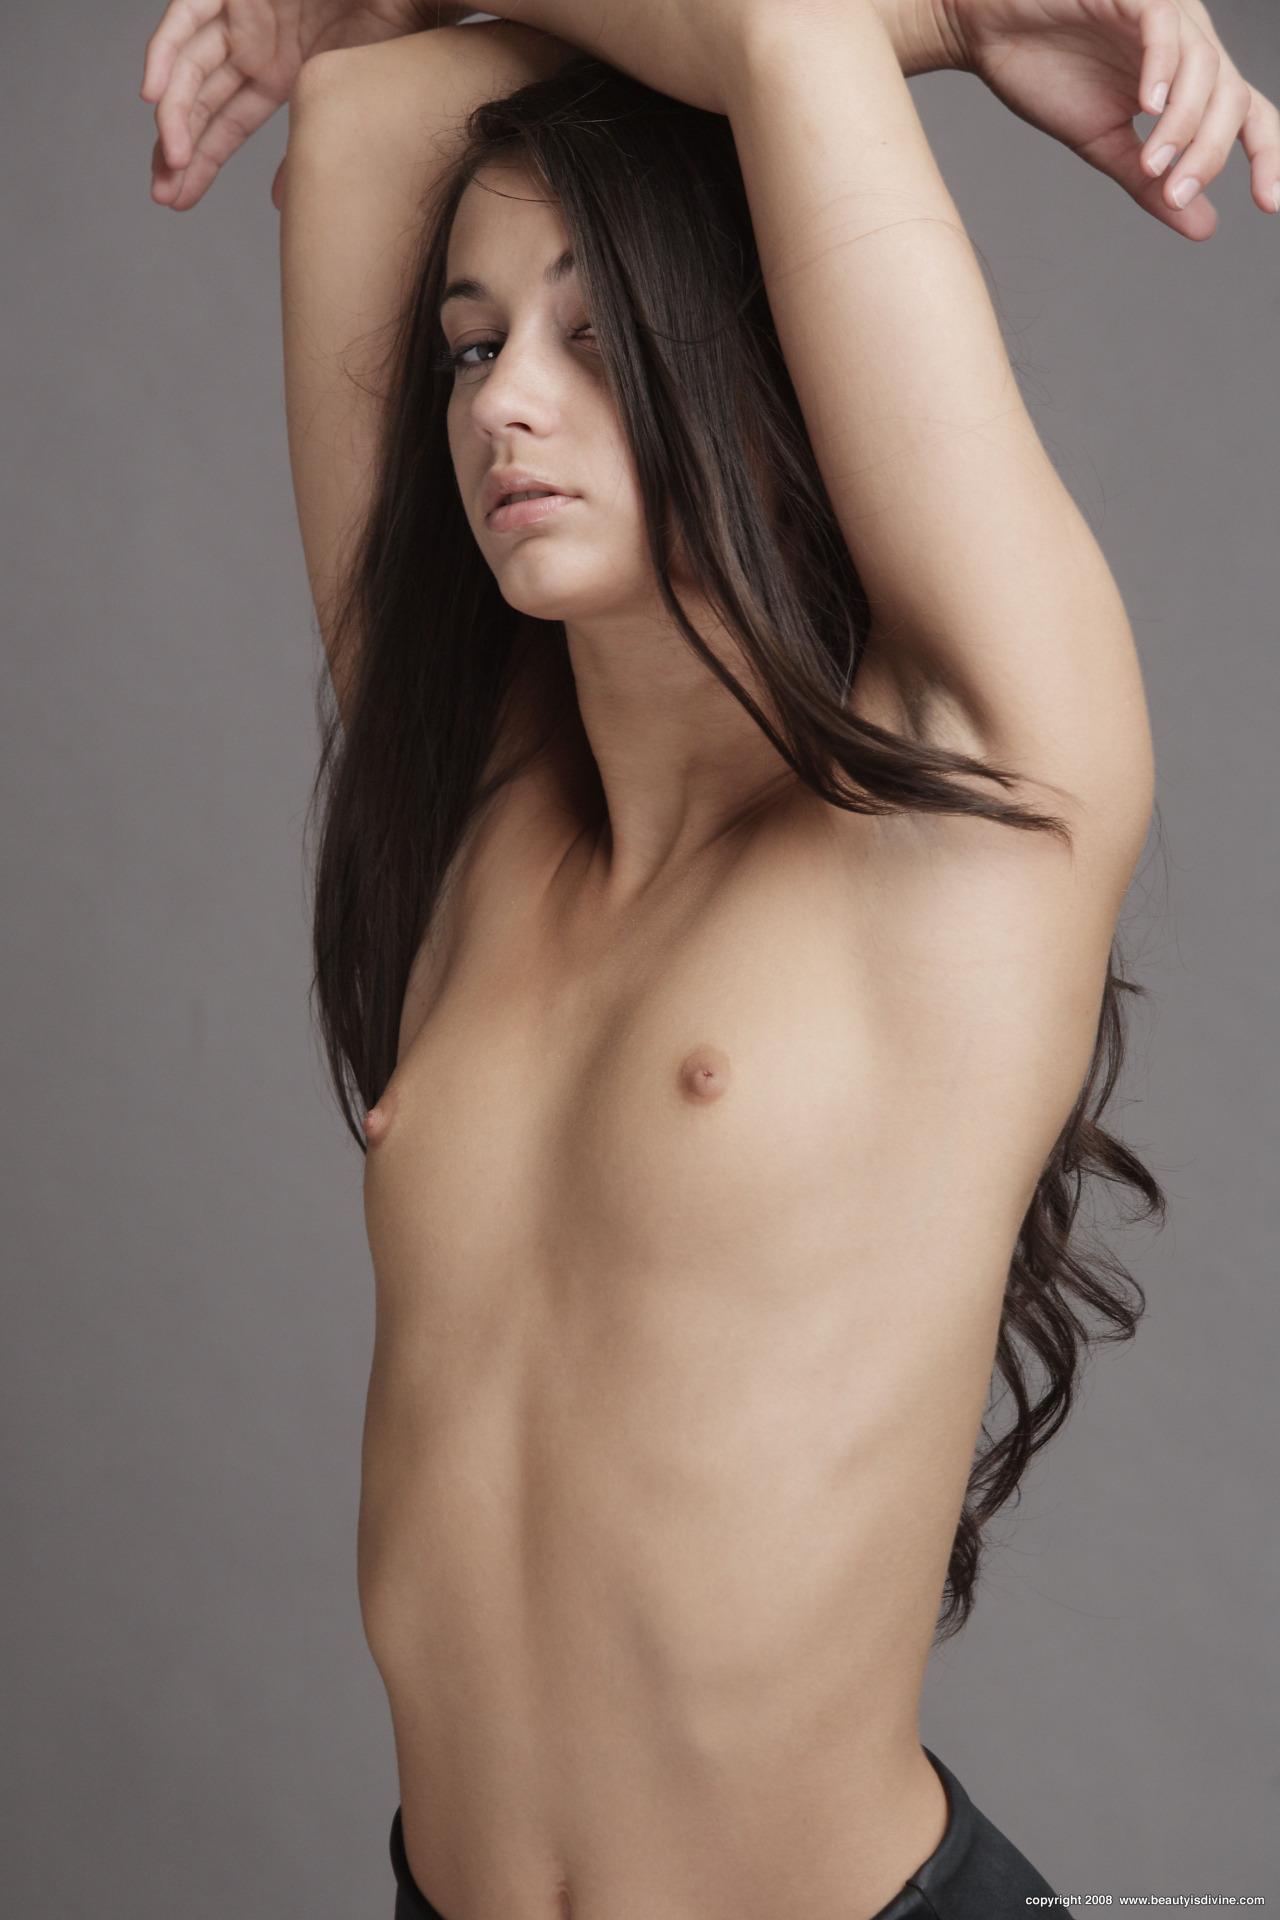 Nude art young women